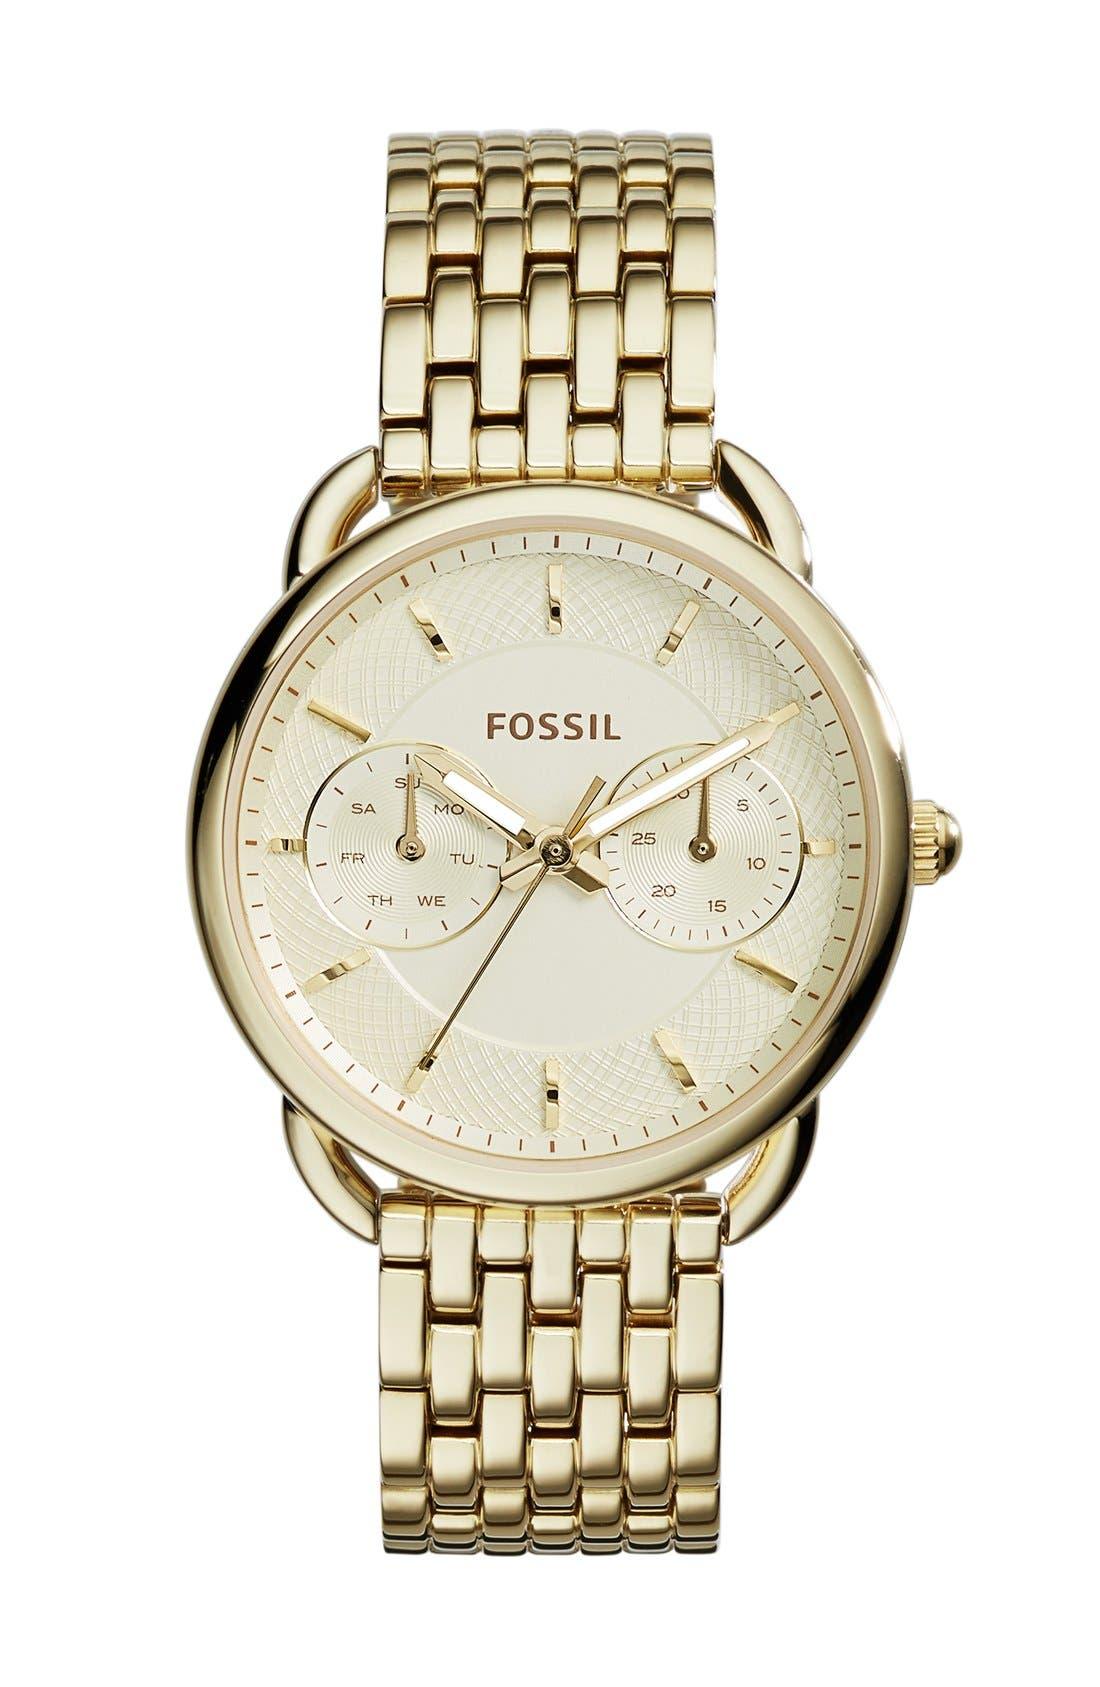 Main Image - Fossil 'Tailor' Multifunction Bracelet Watch, 16mm